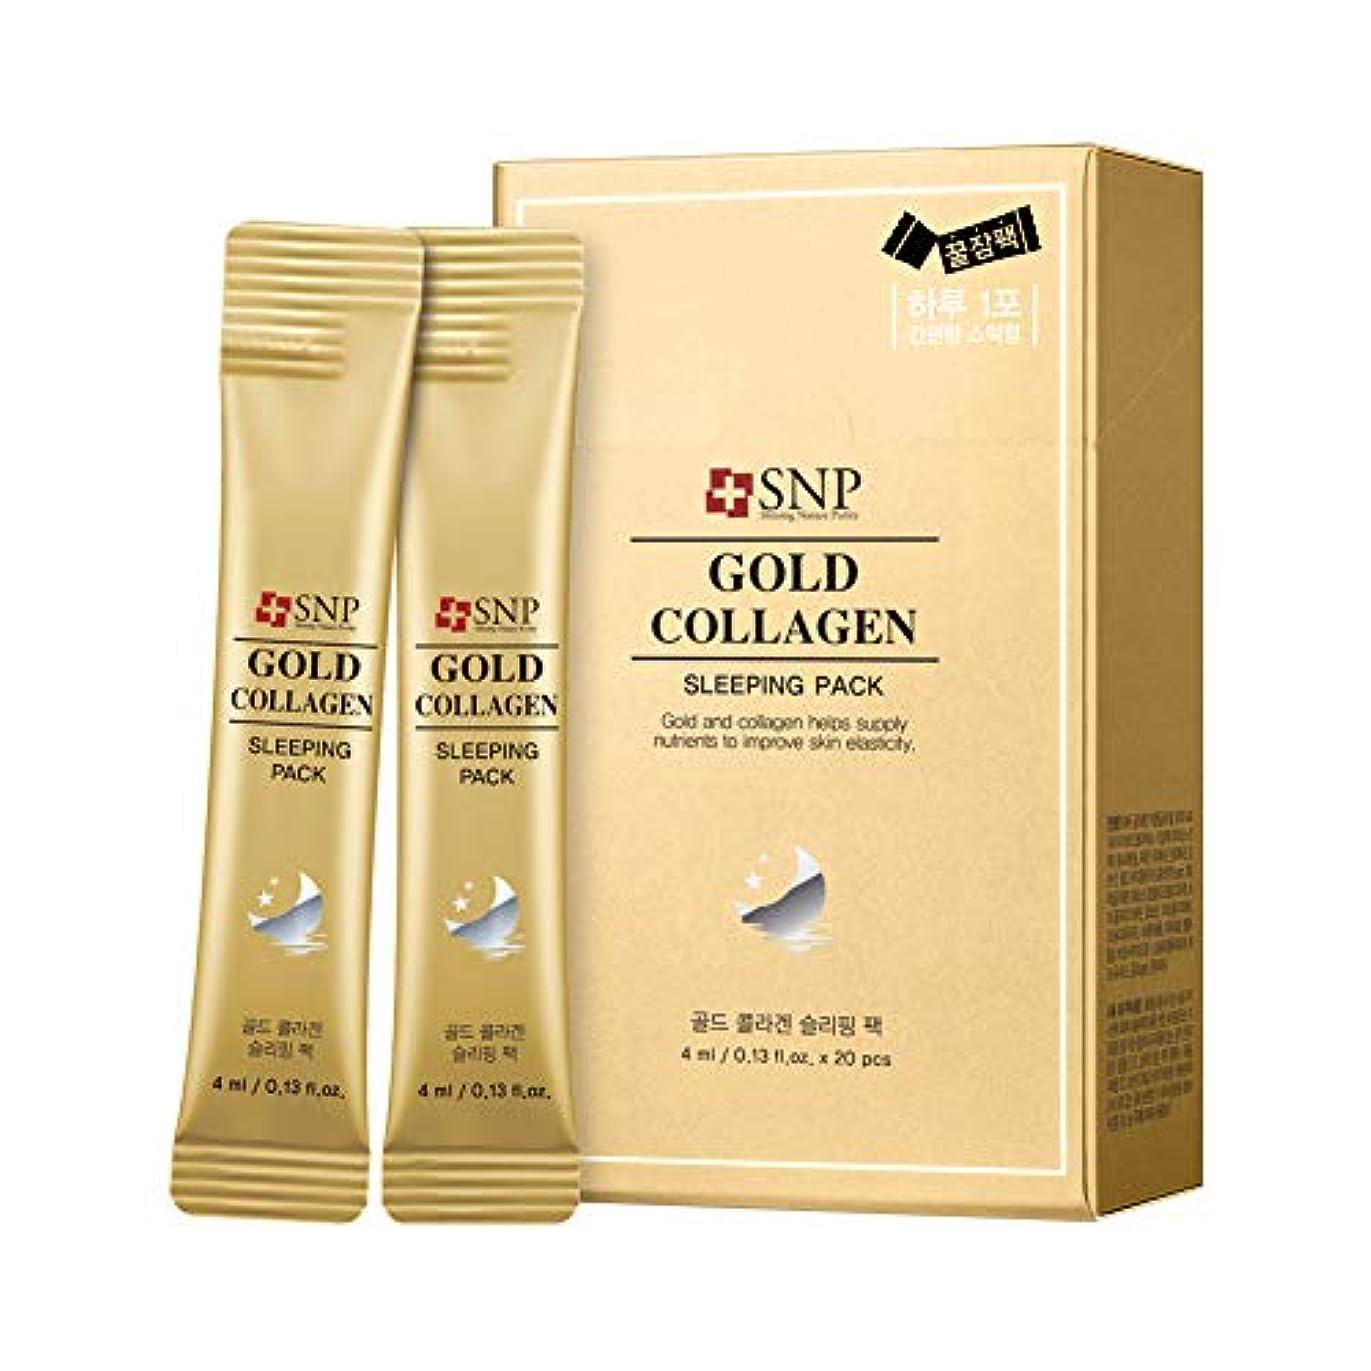 領事館加速度マカダムSNP Gold Collagen Sleeping Pack 20x4ml/0.13oz並行輸入品